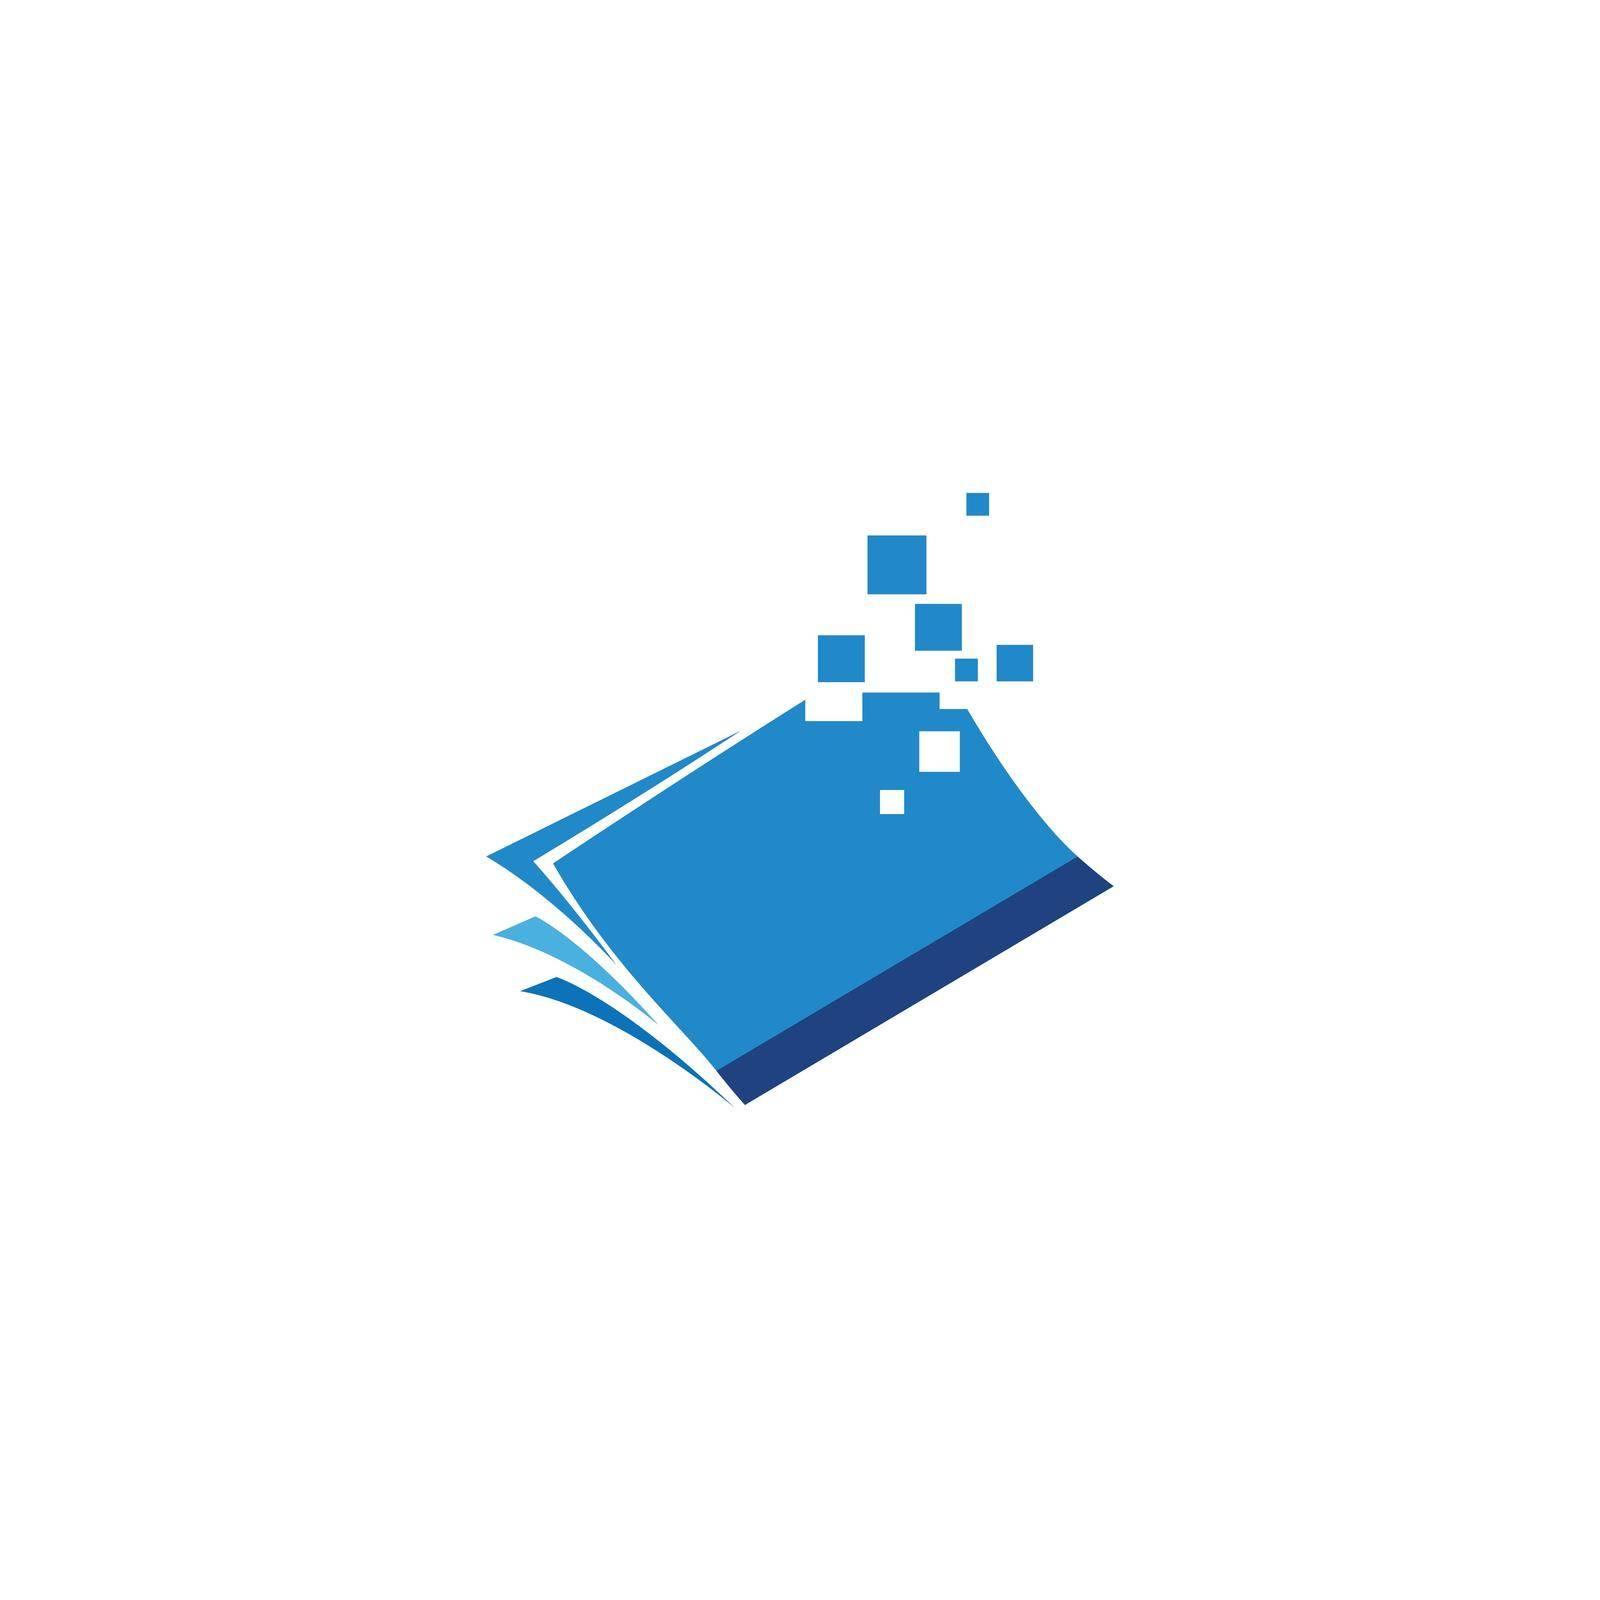 E-book modern digital book design vector